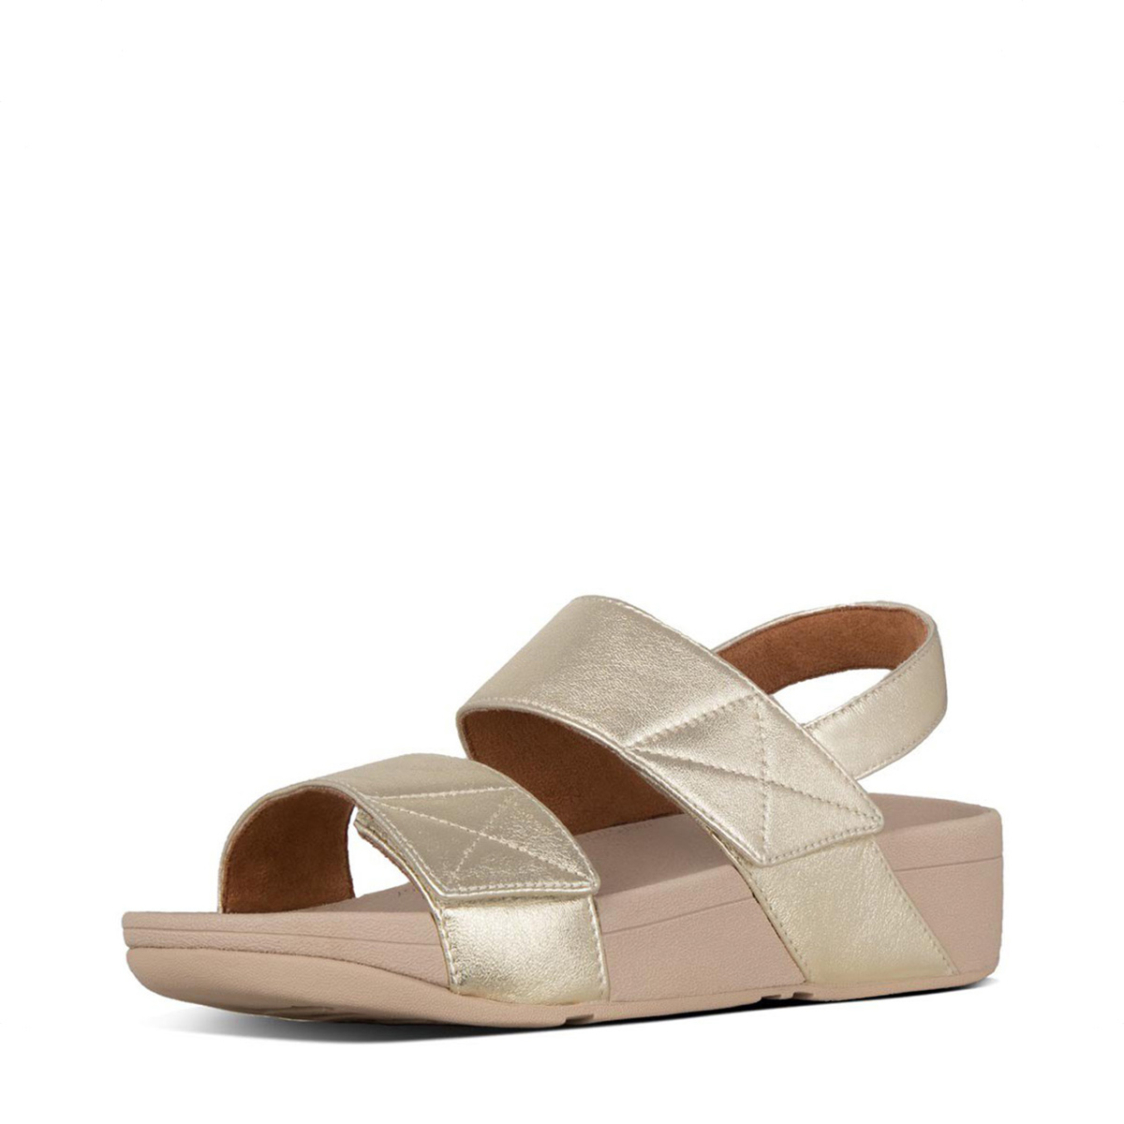 Fitflop Mina Back Strap Sandals Platino